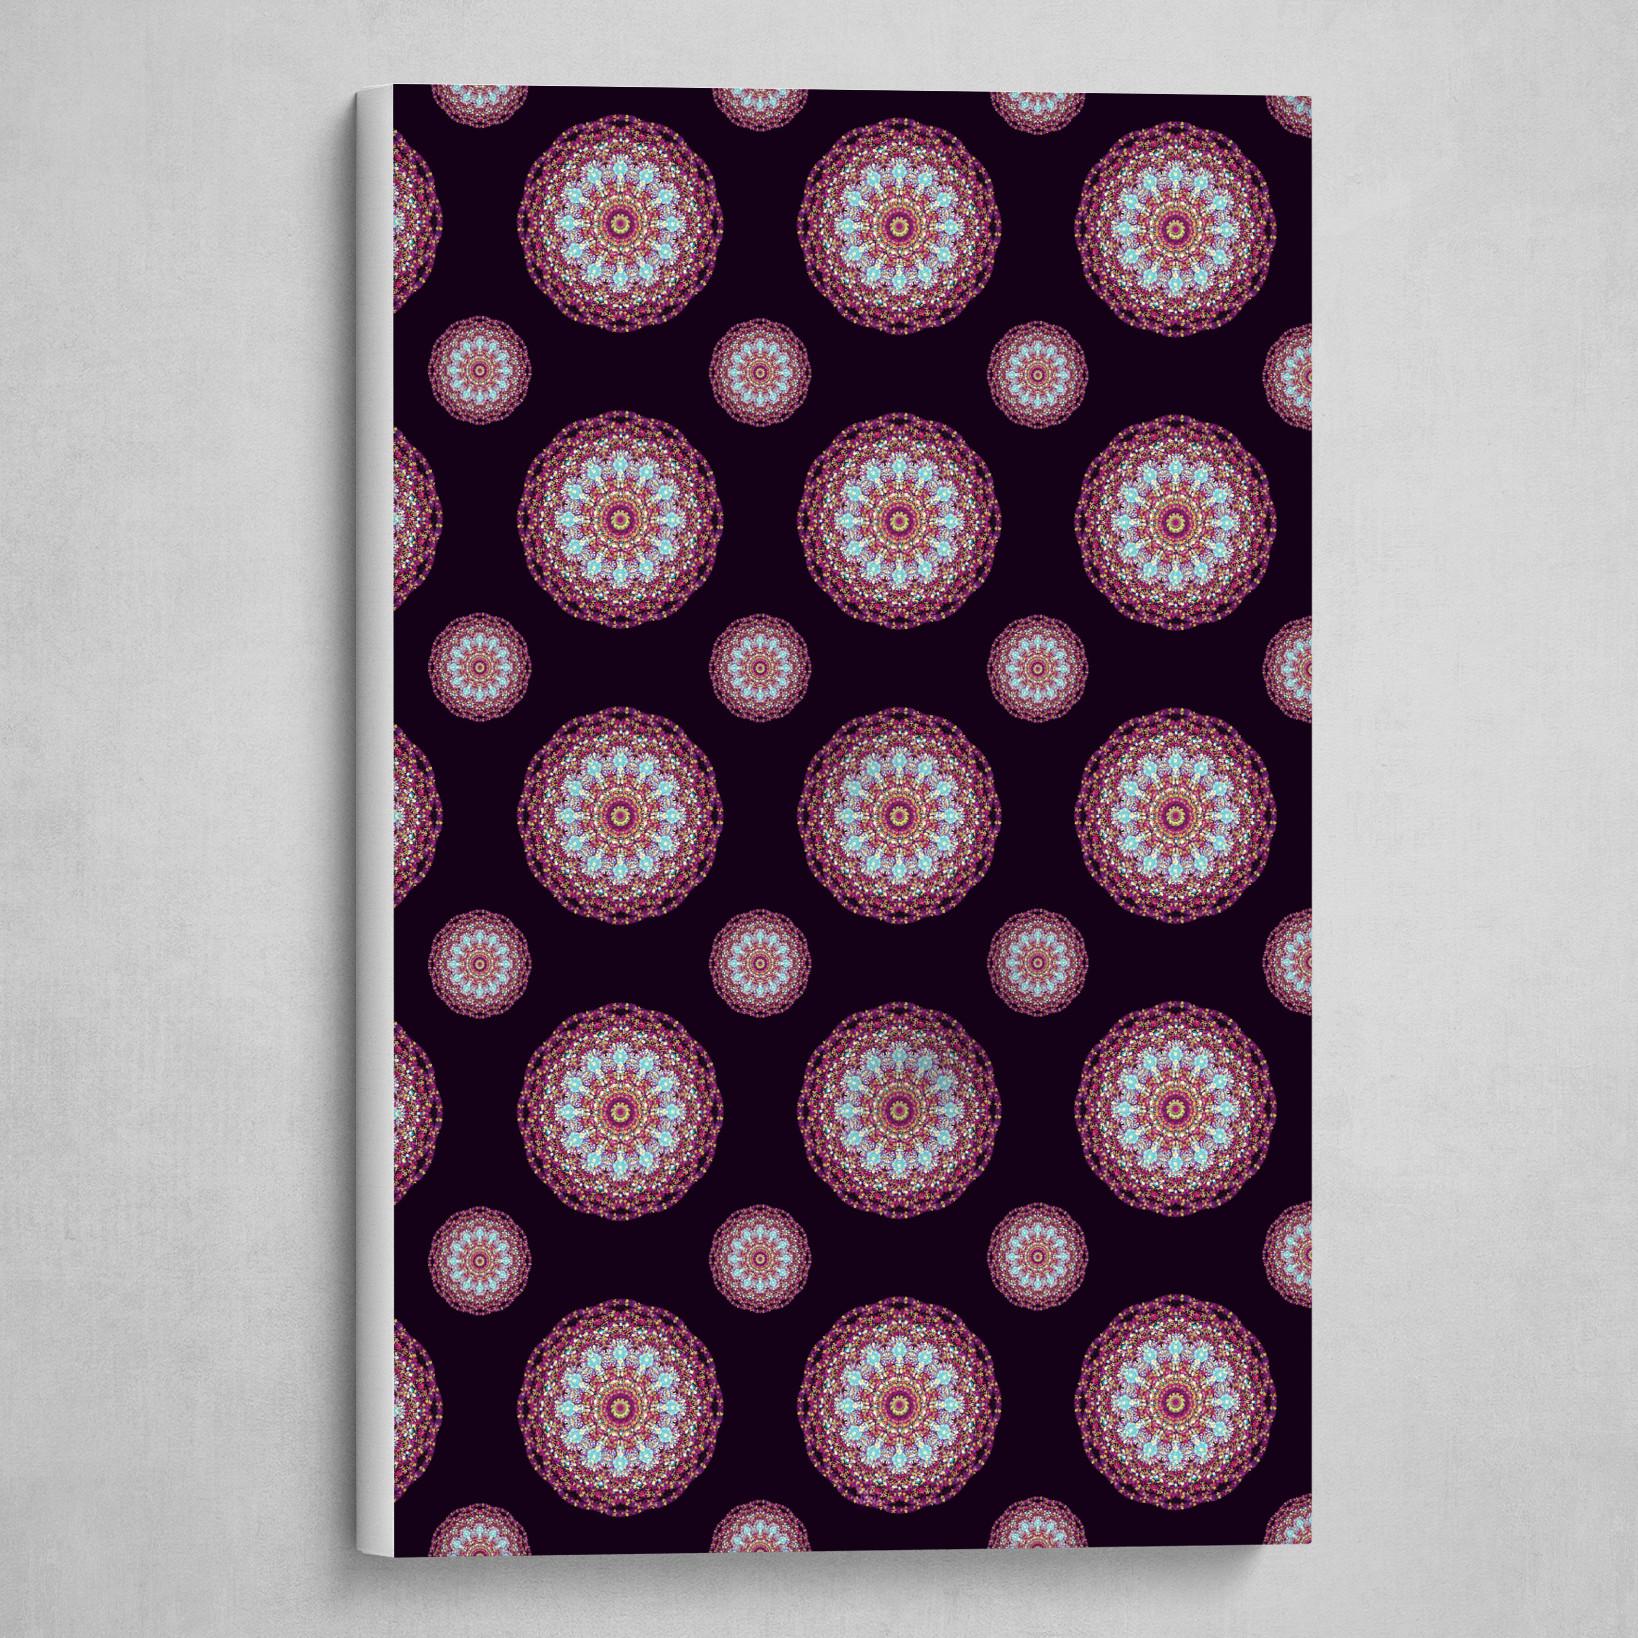 Mandala 2.0 Pattern (vertical)